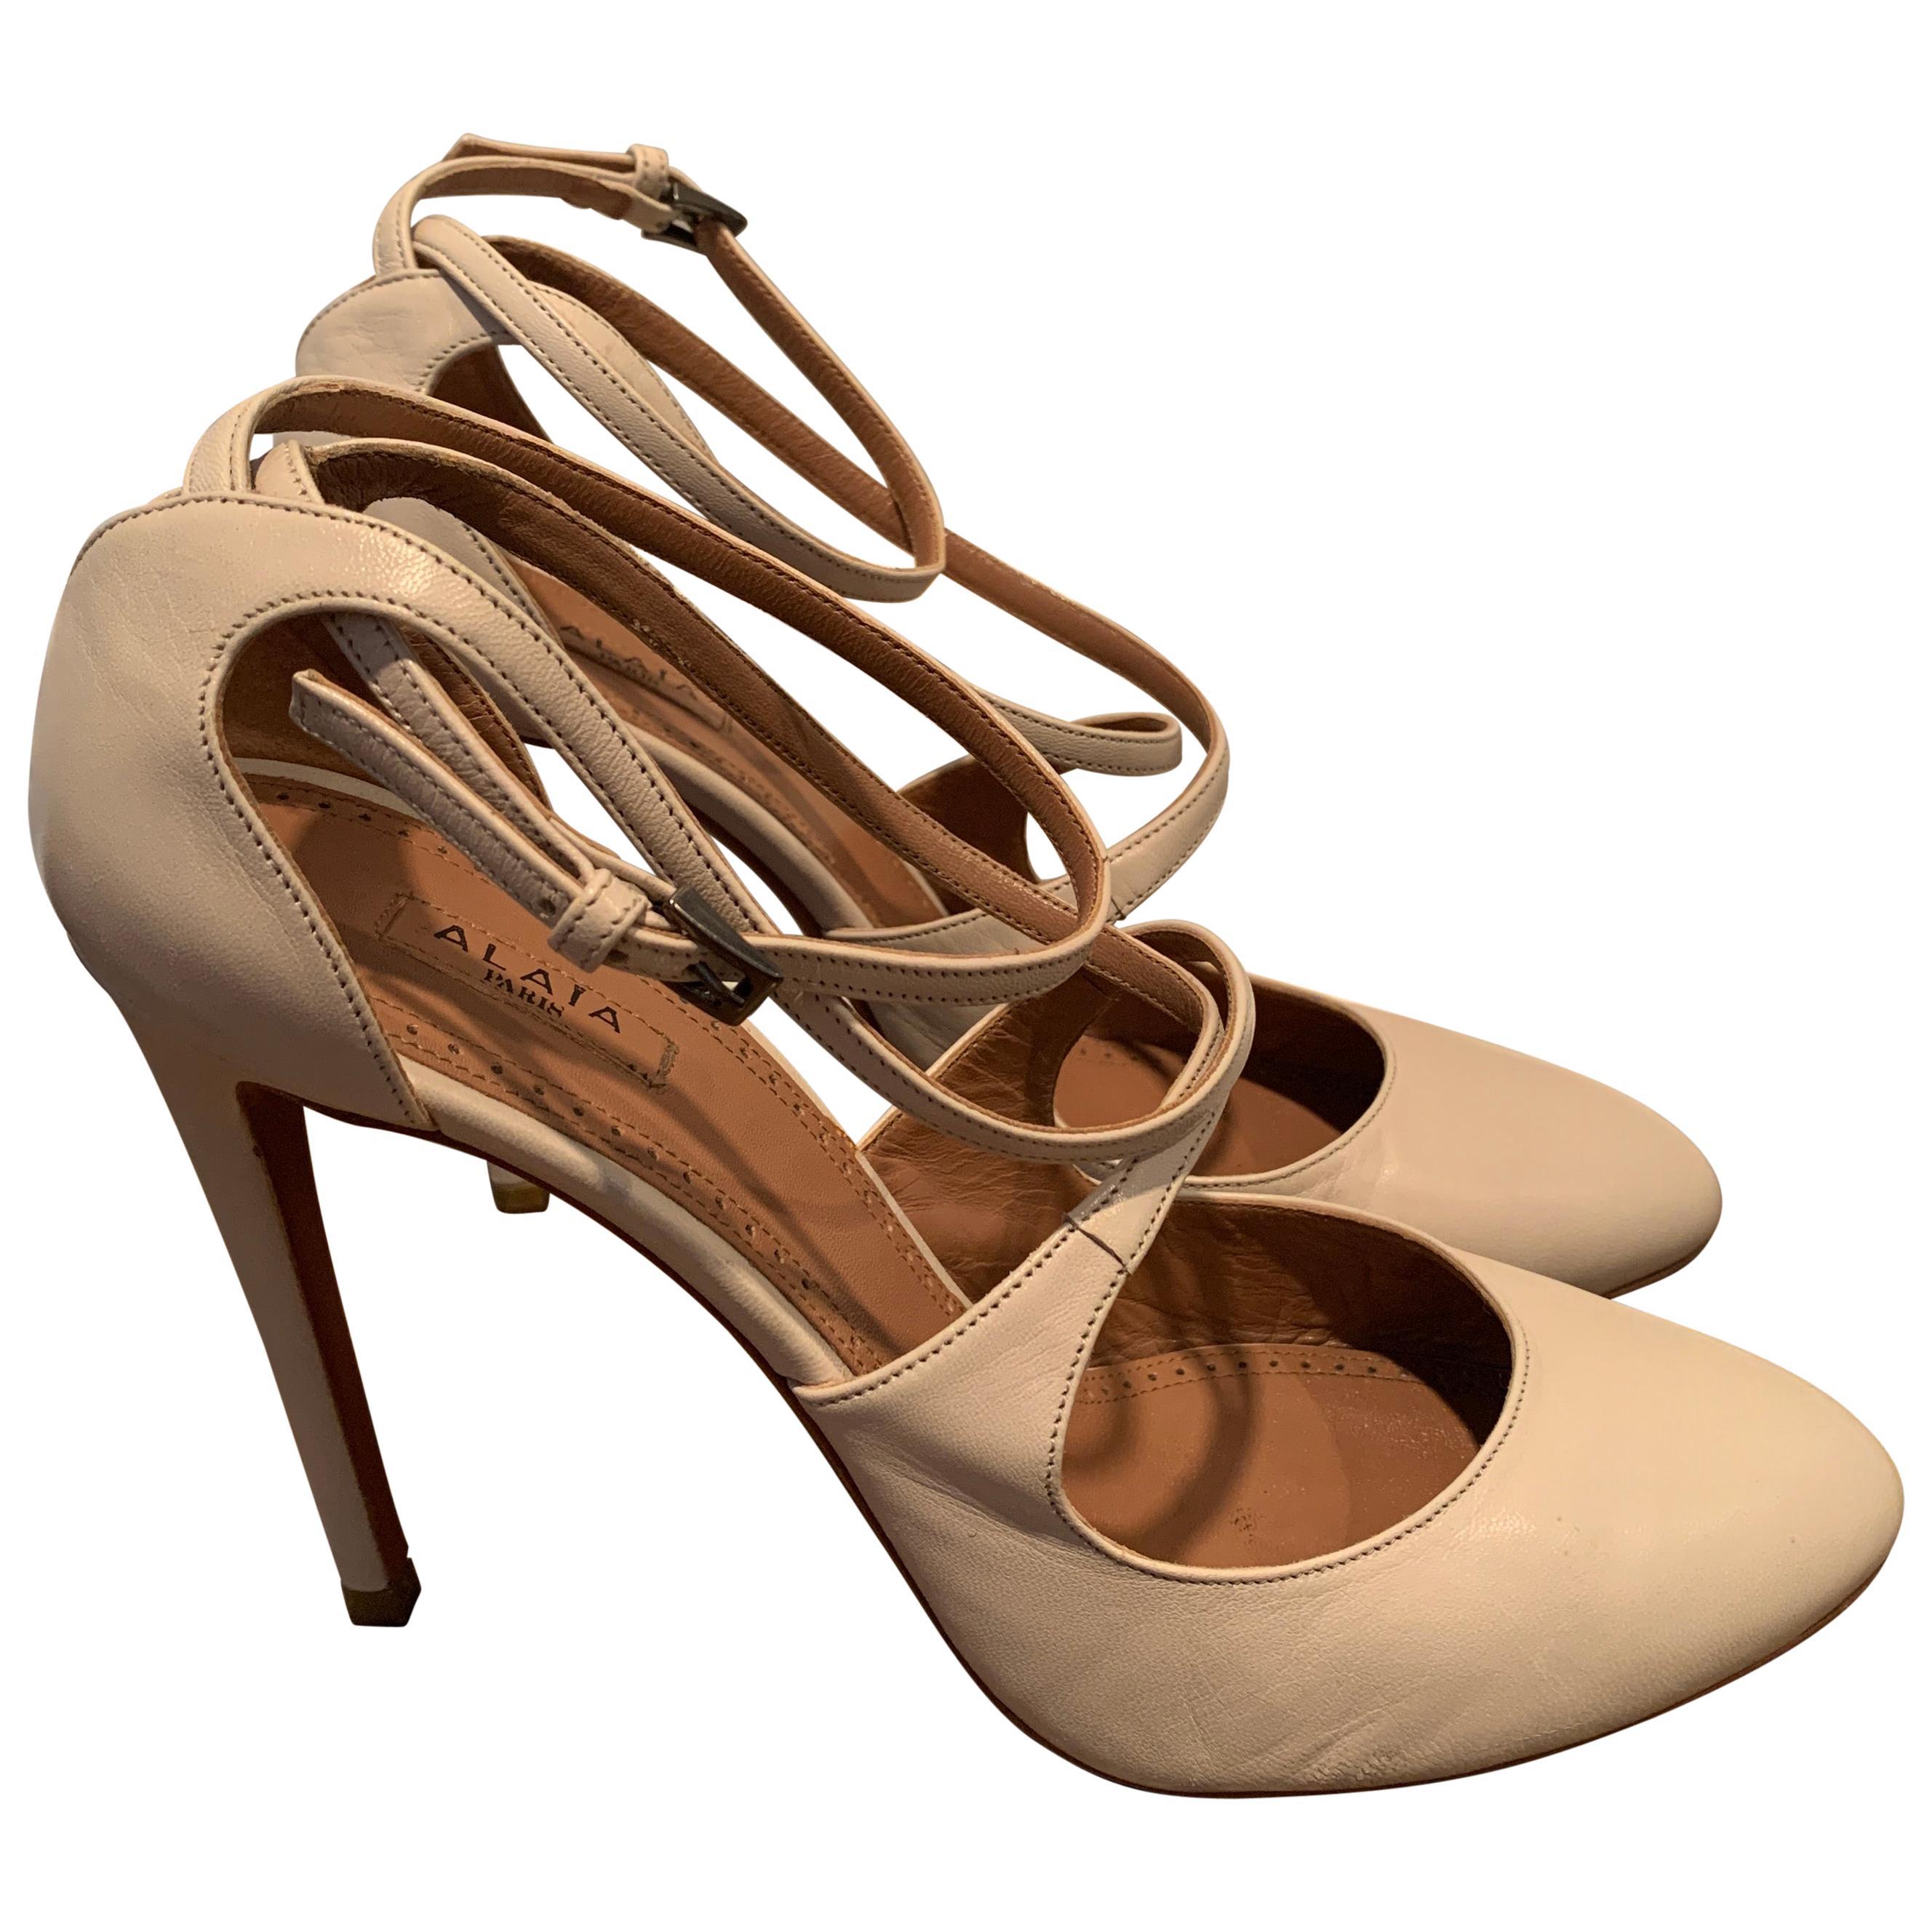 Alaia Nude Mary-jane Pumps Size 40.5